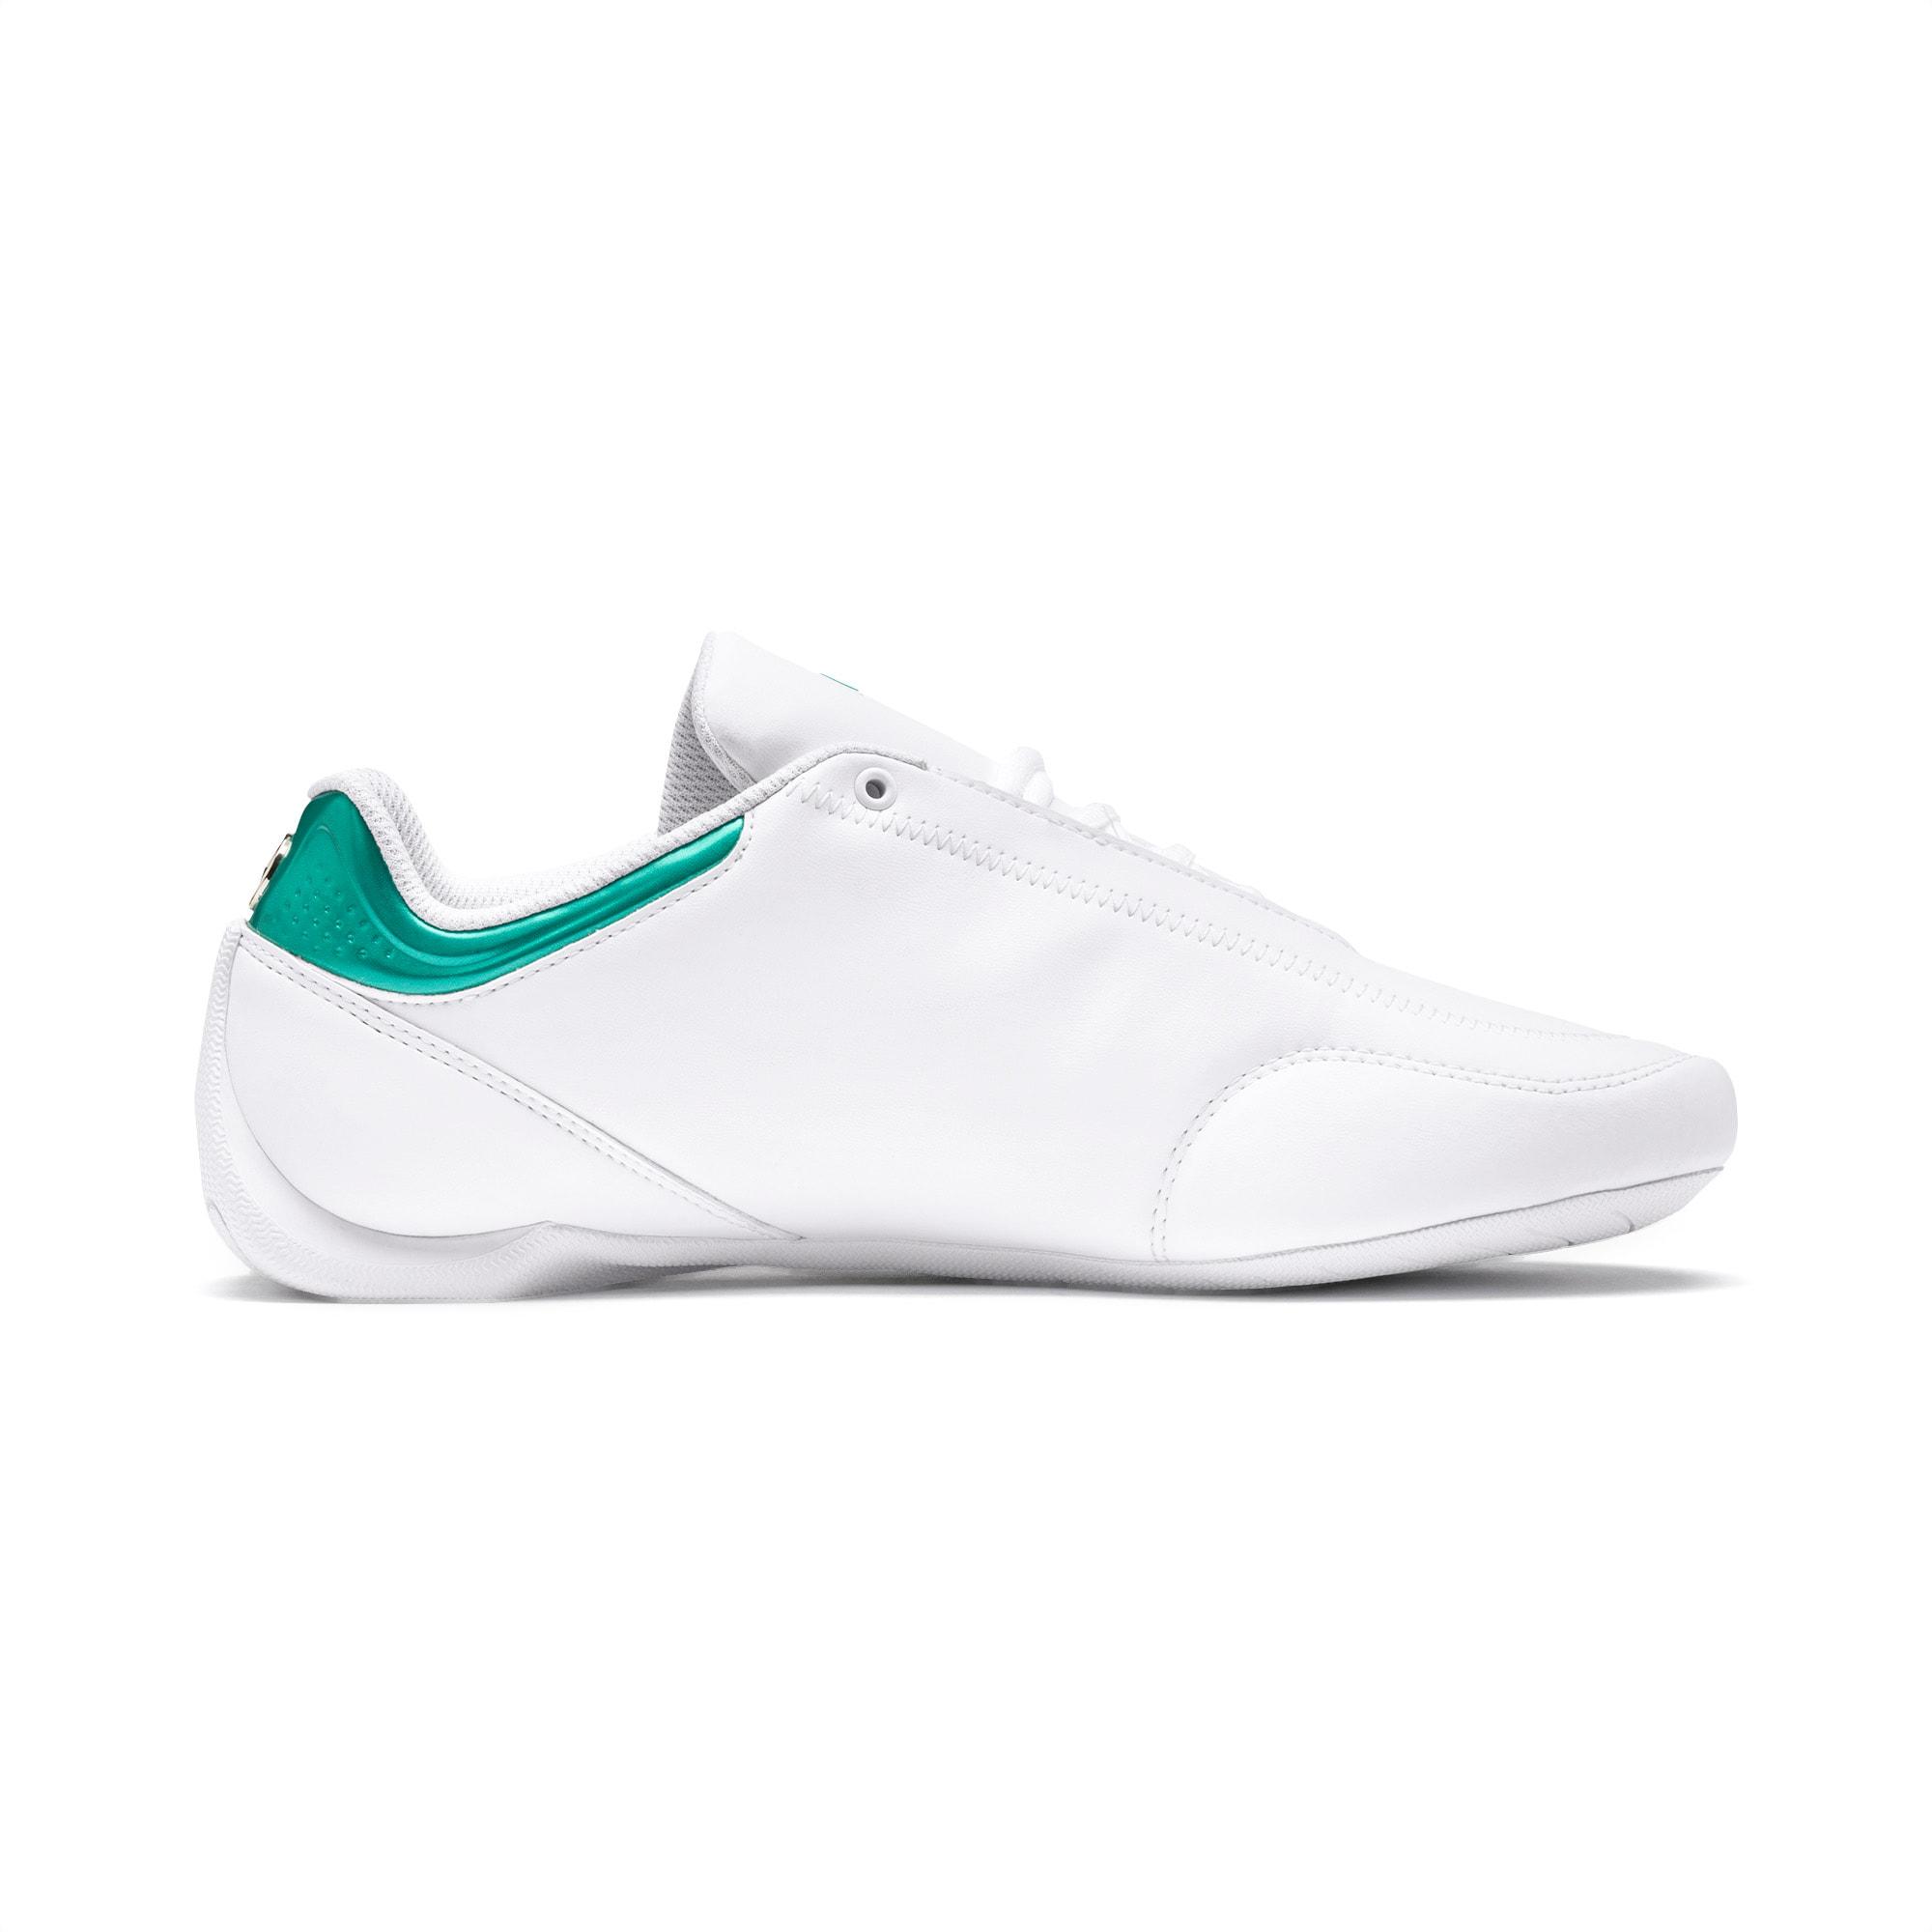 puma amg chaussure